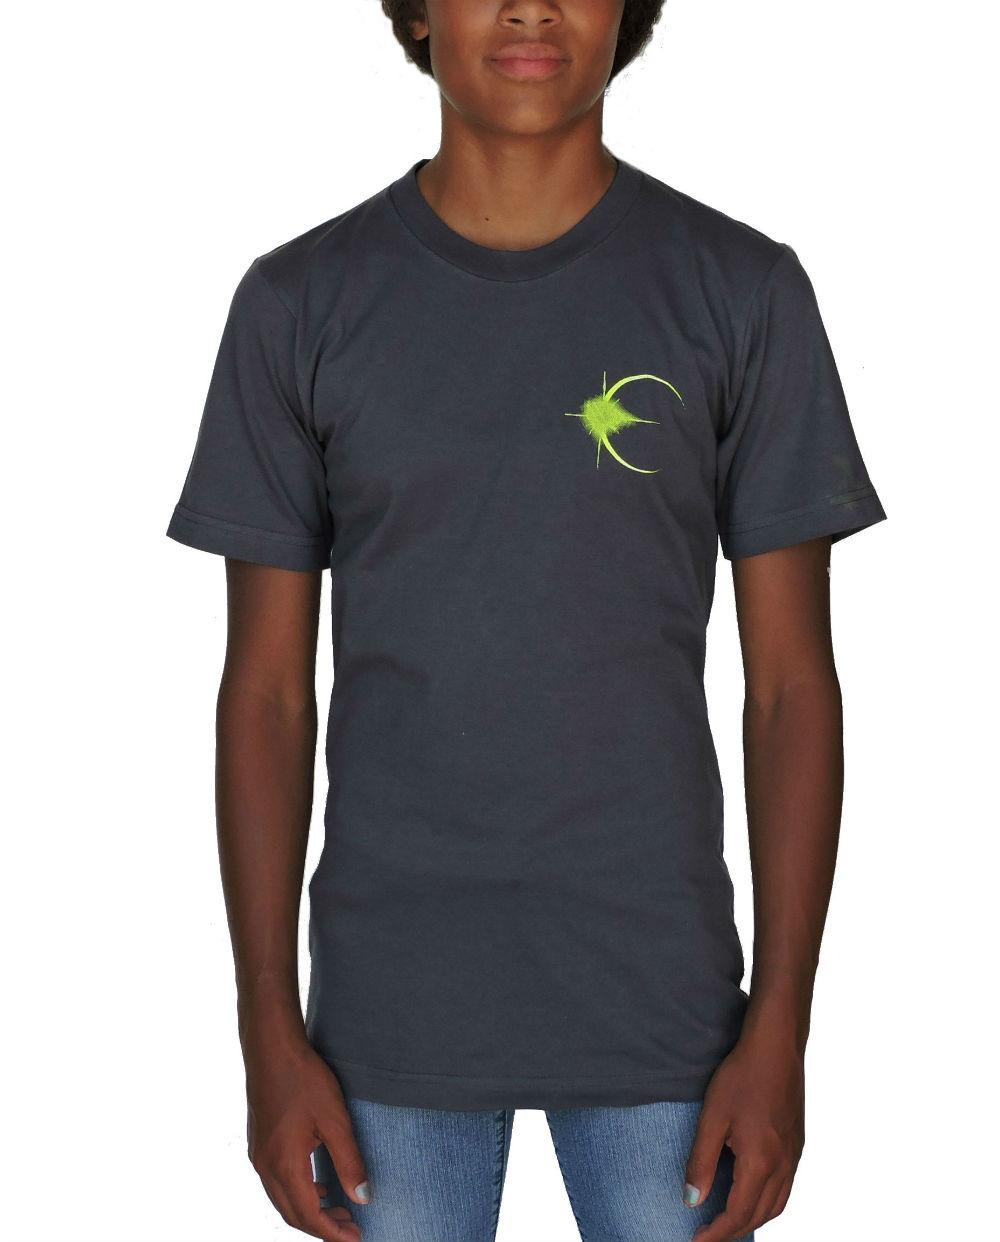 Sephlin - Lady E Girl's Solar Eclipse Grey T_Shirt